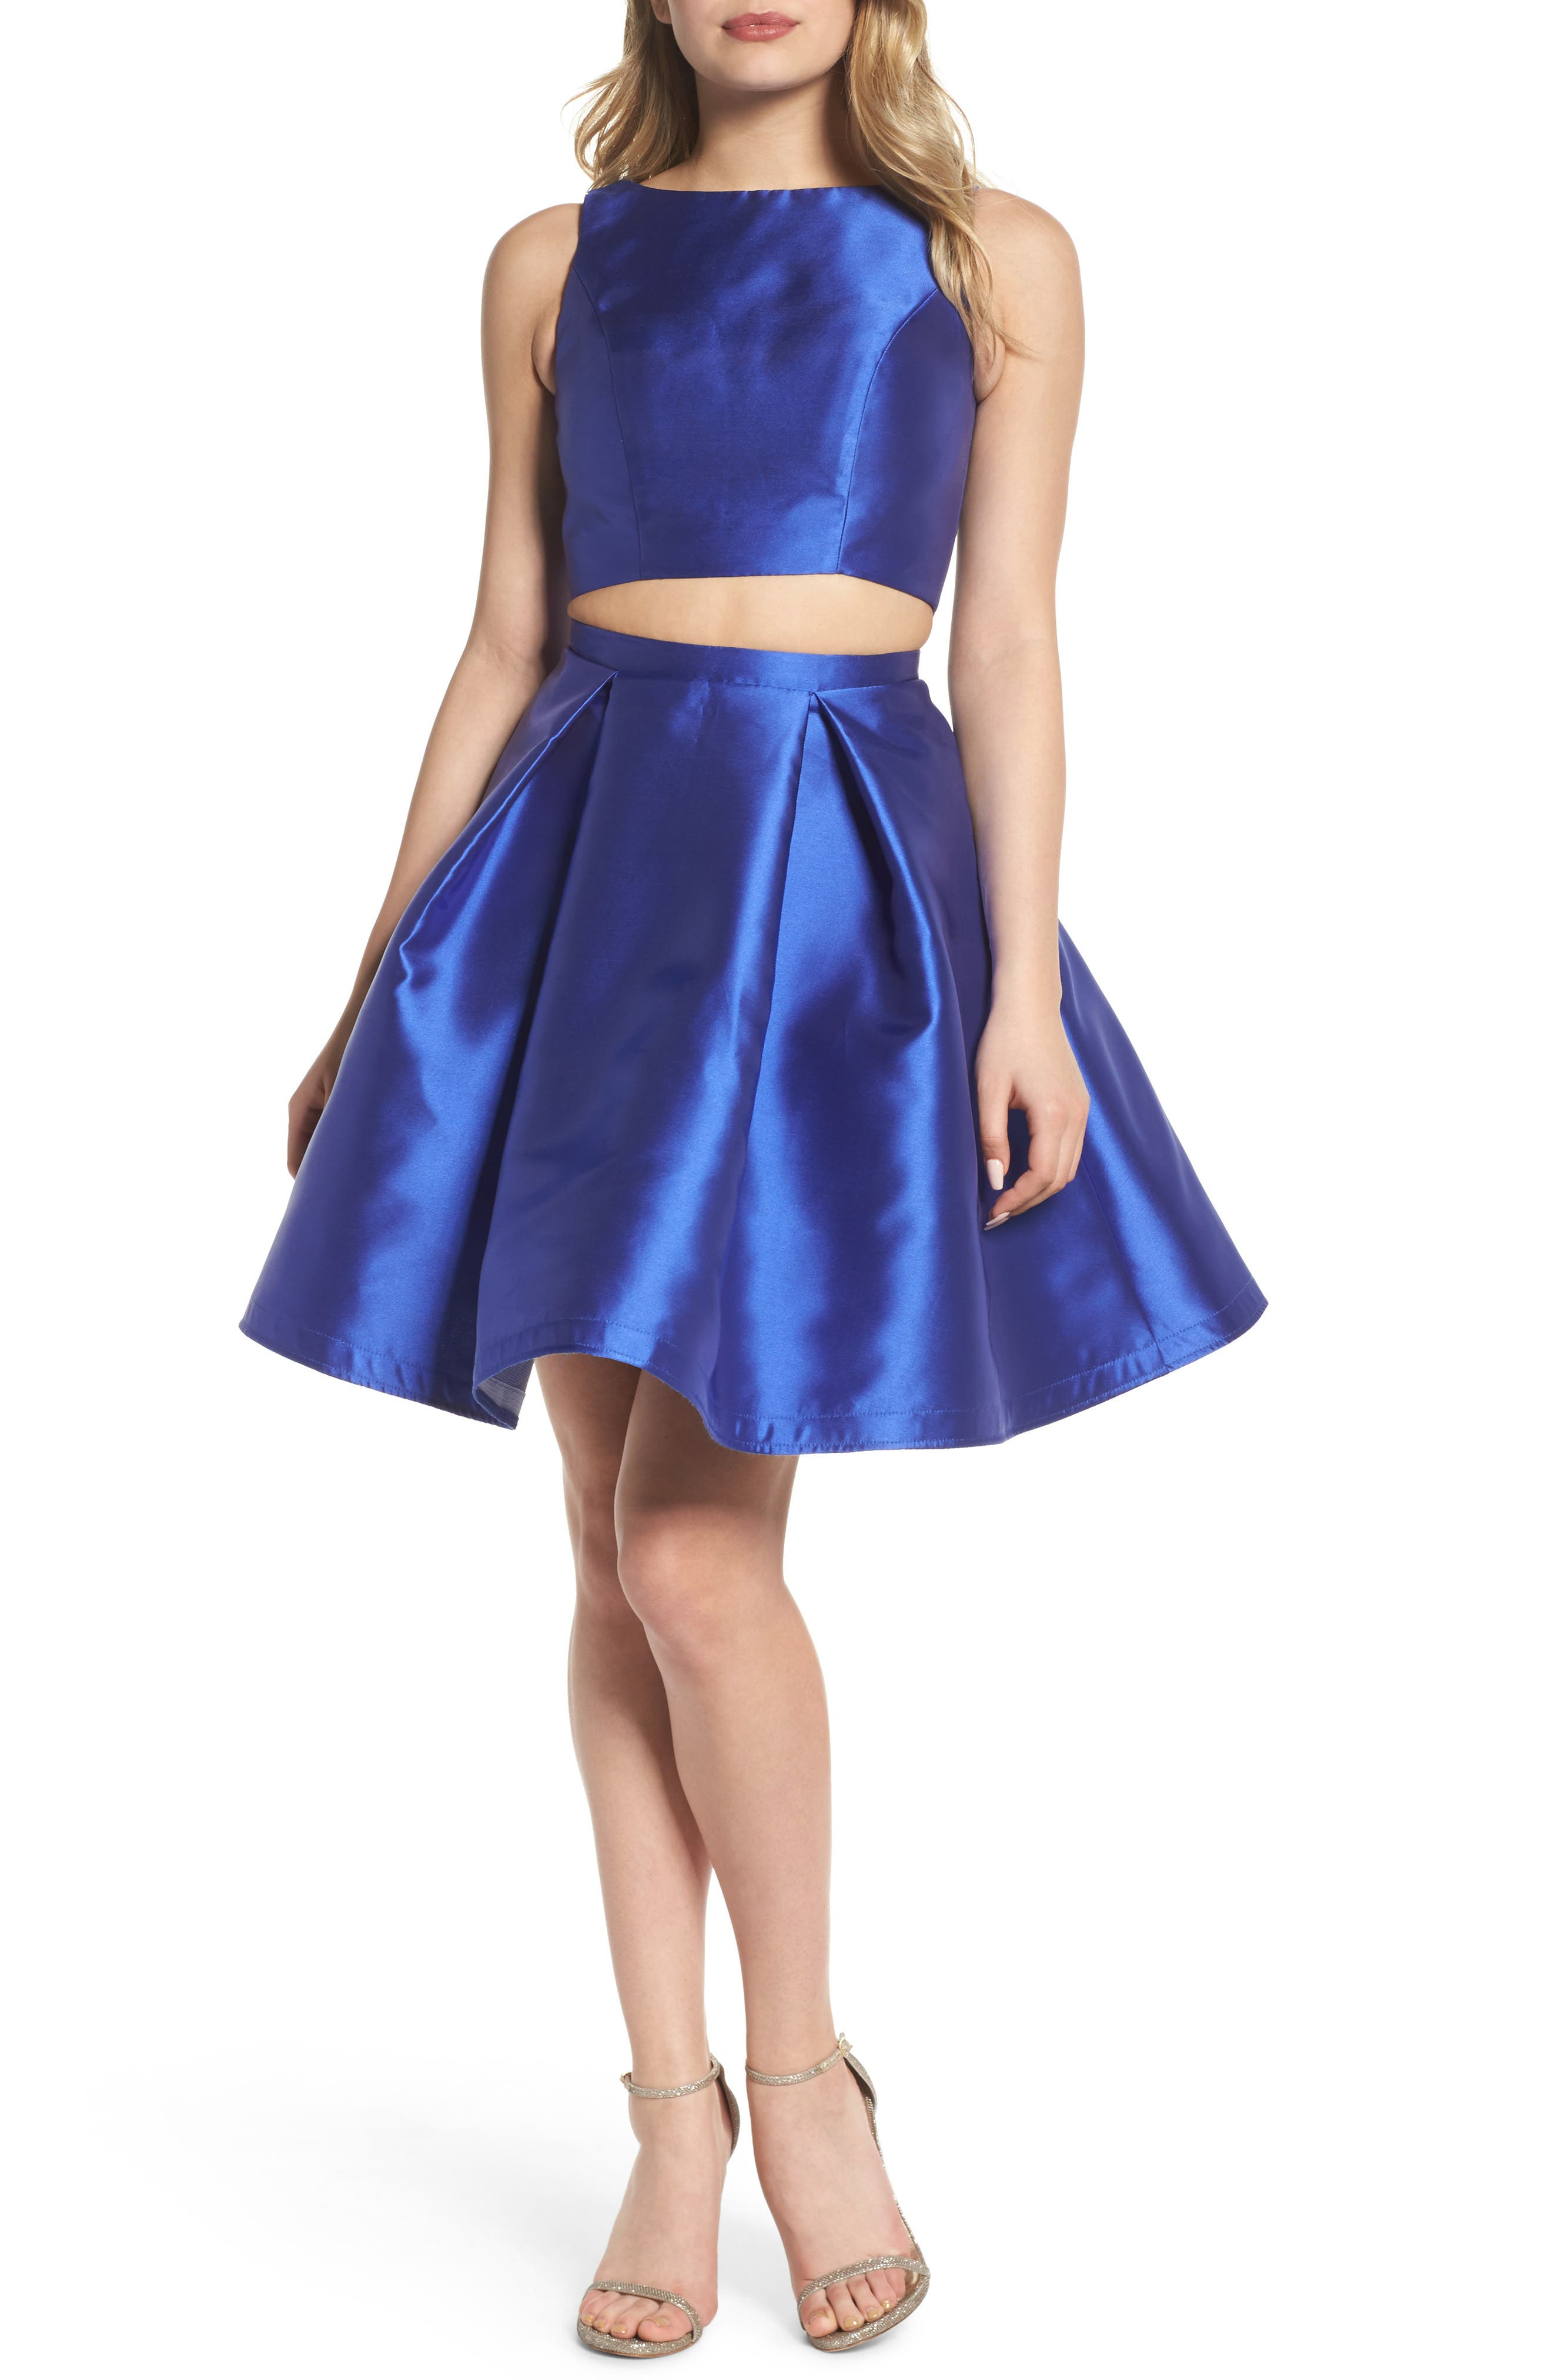 Skater Skirt Two-Piece Dress,                             Main thumbnail 1, color,                             SAPPHIRE